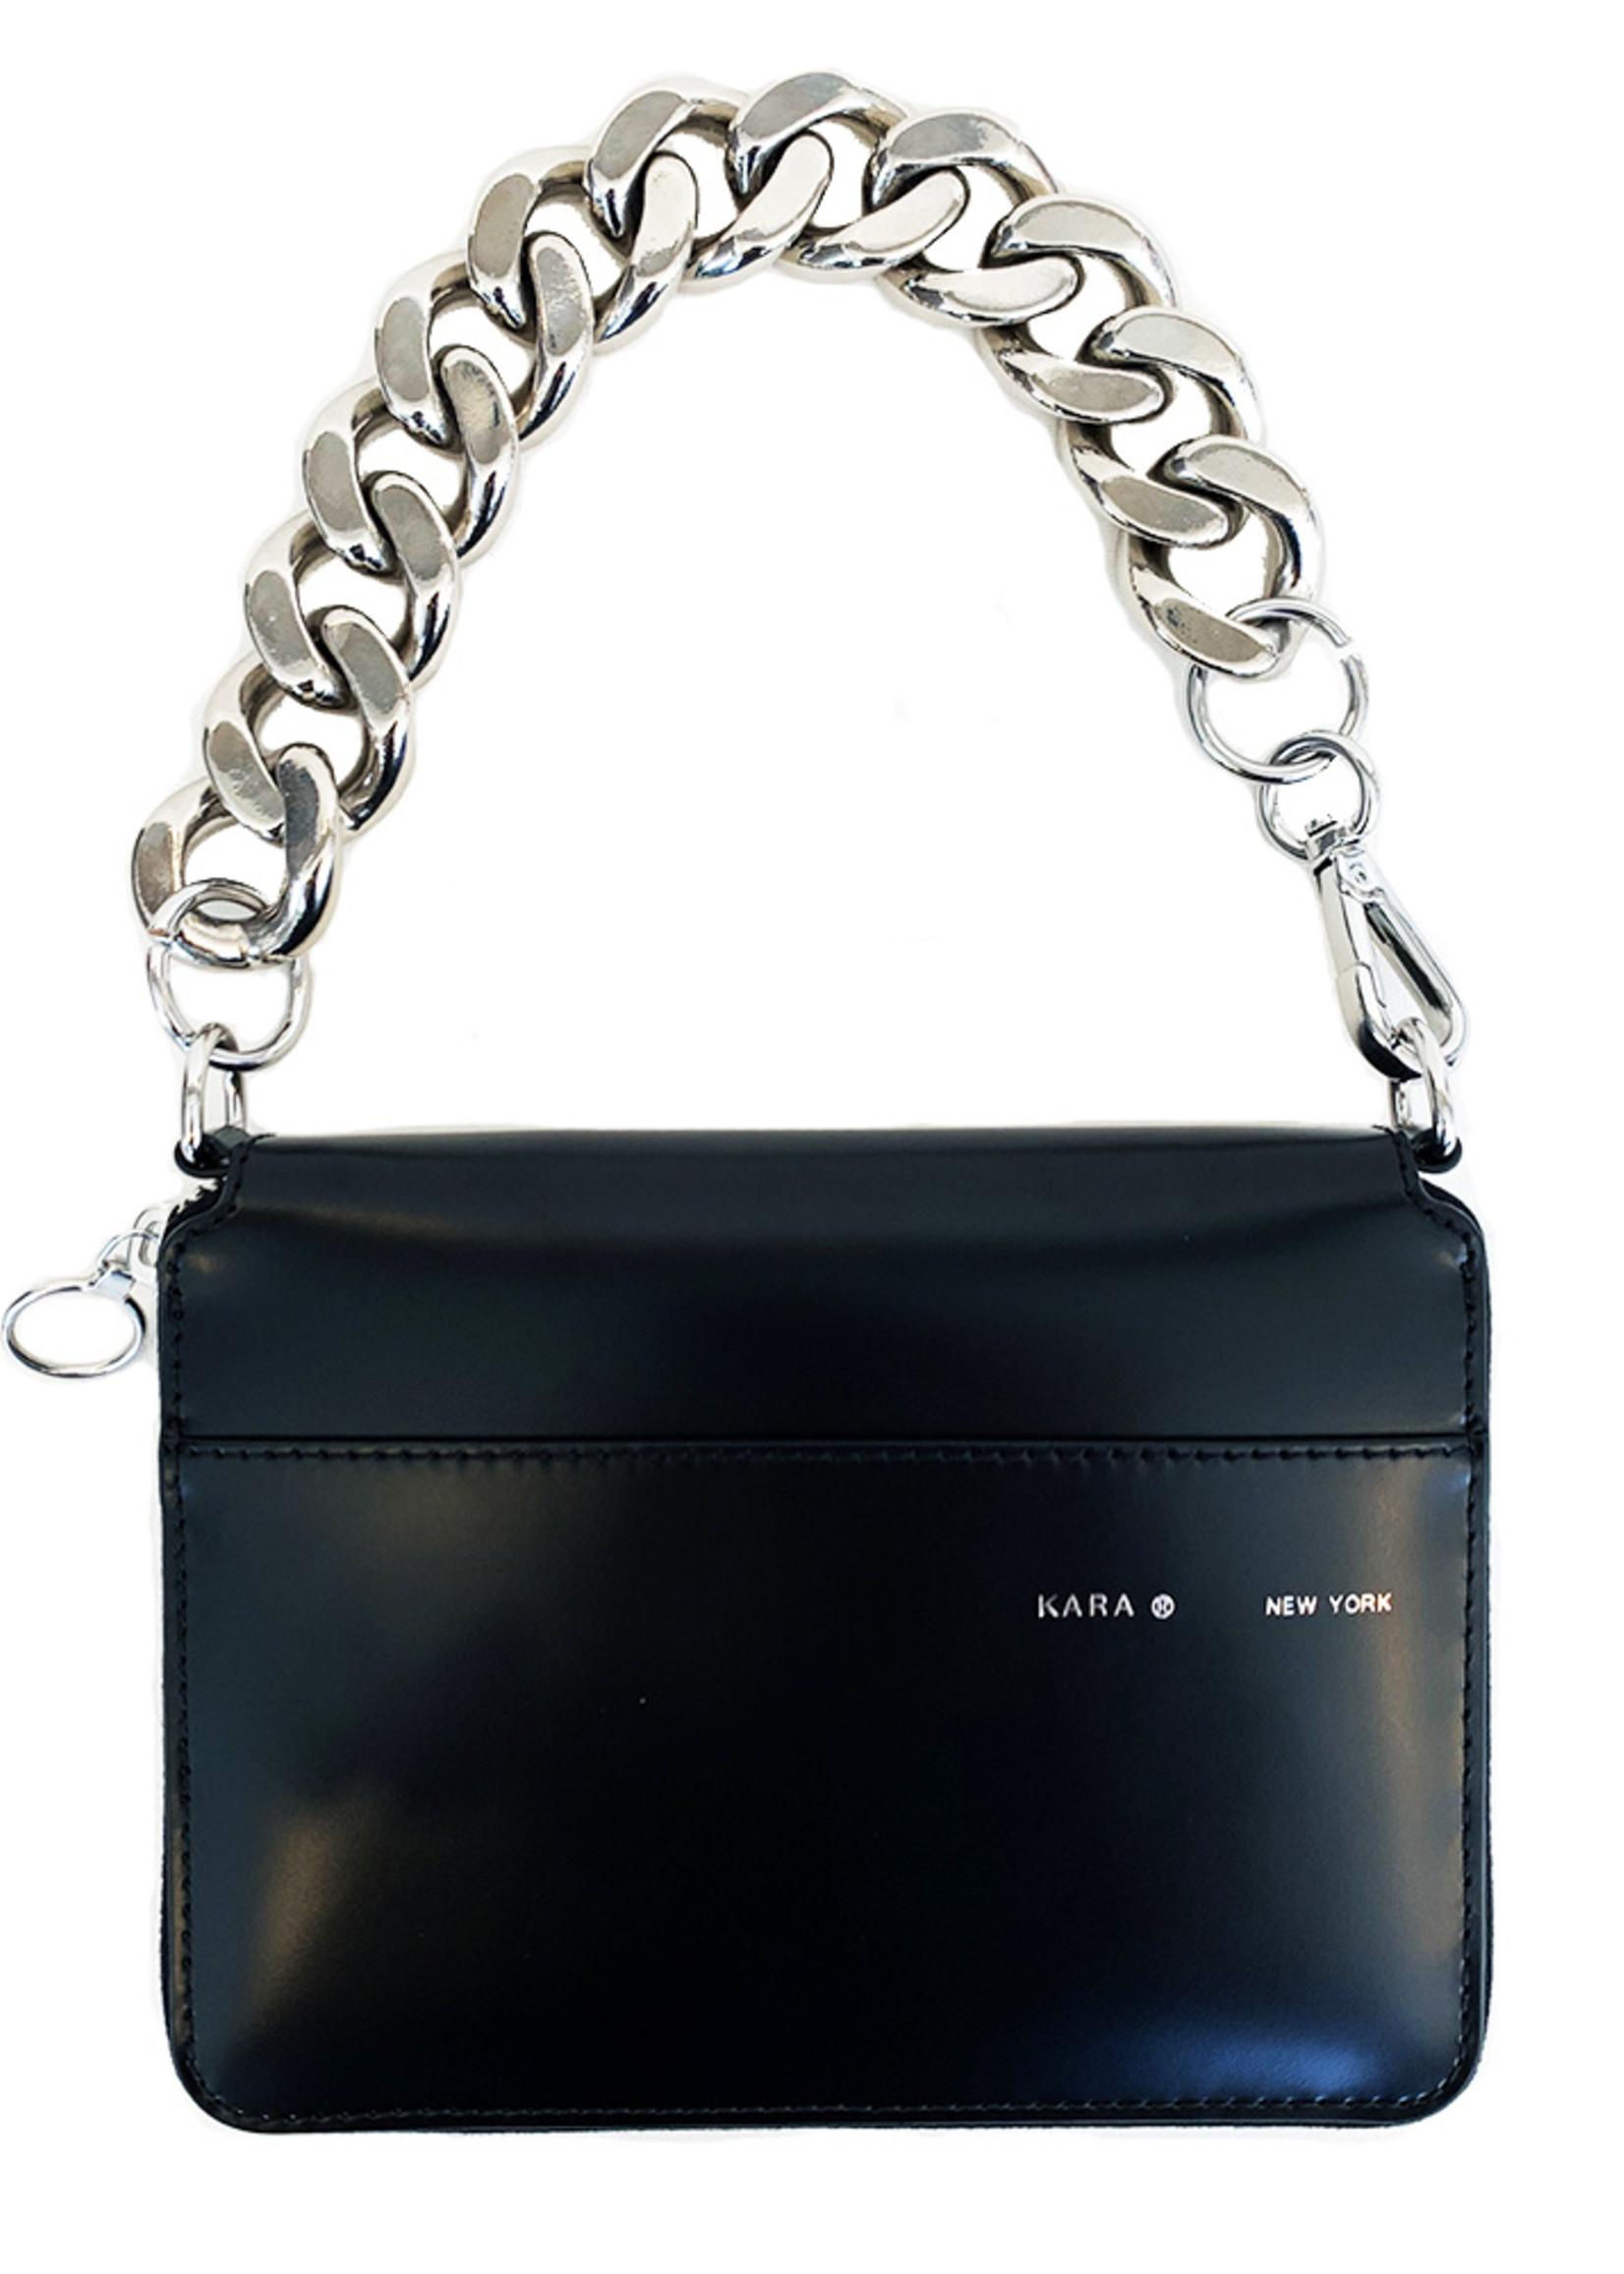 KARA Large Bike Chain Wristlet in Black